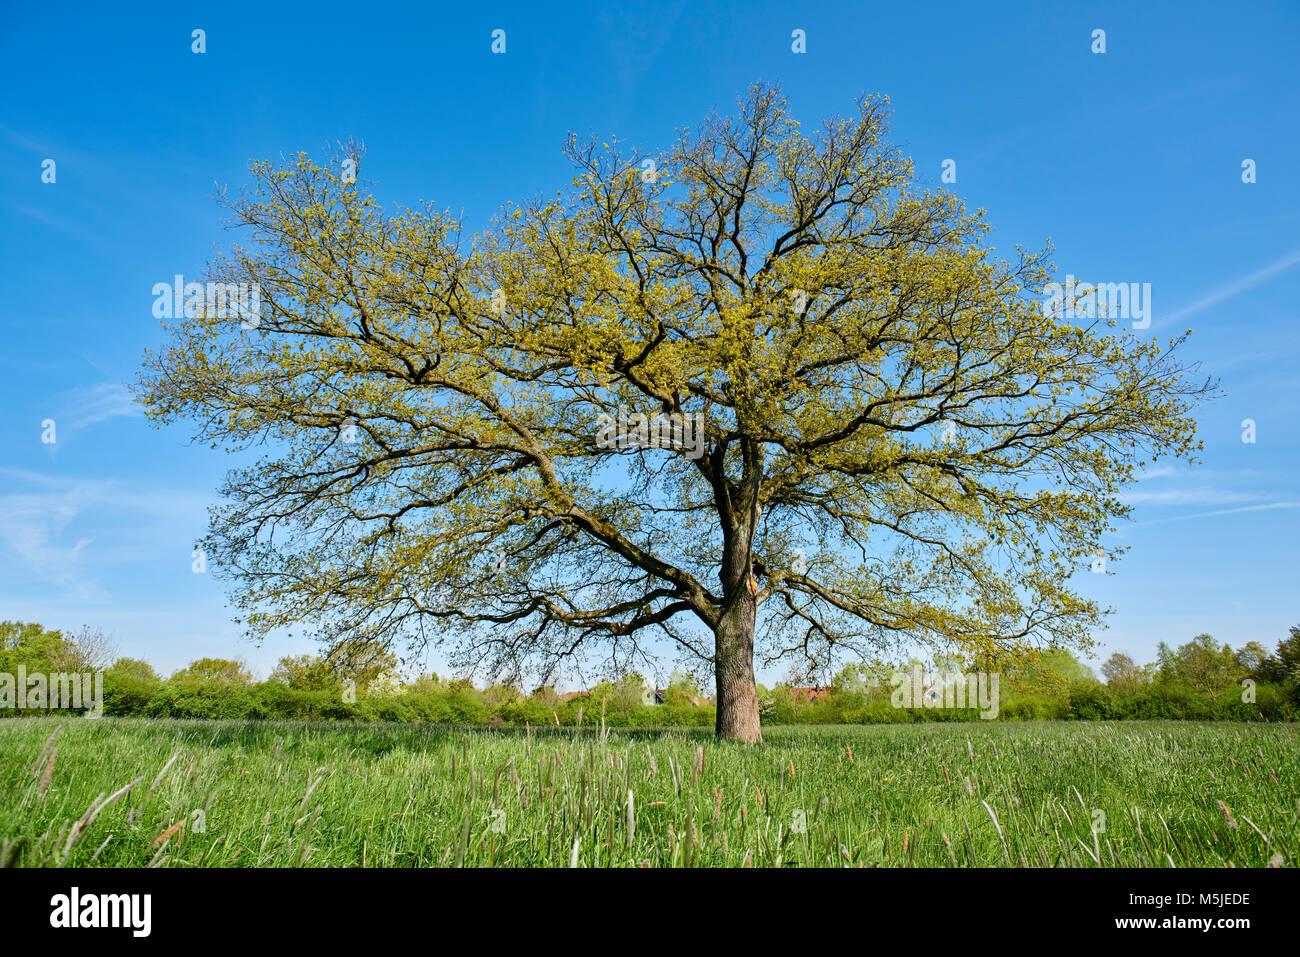 Eiche im Frühling - Stock Image